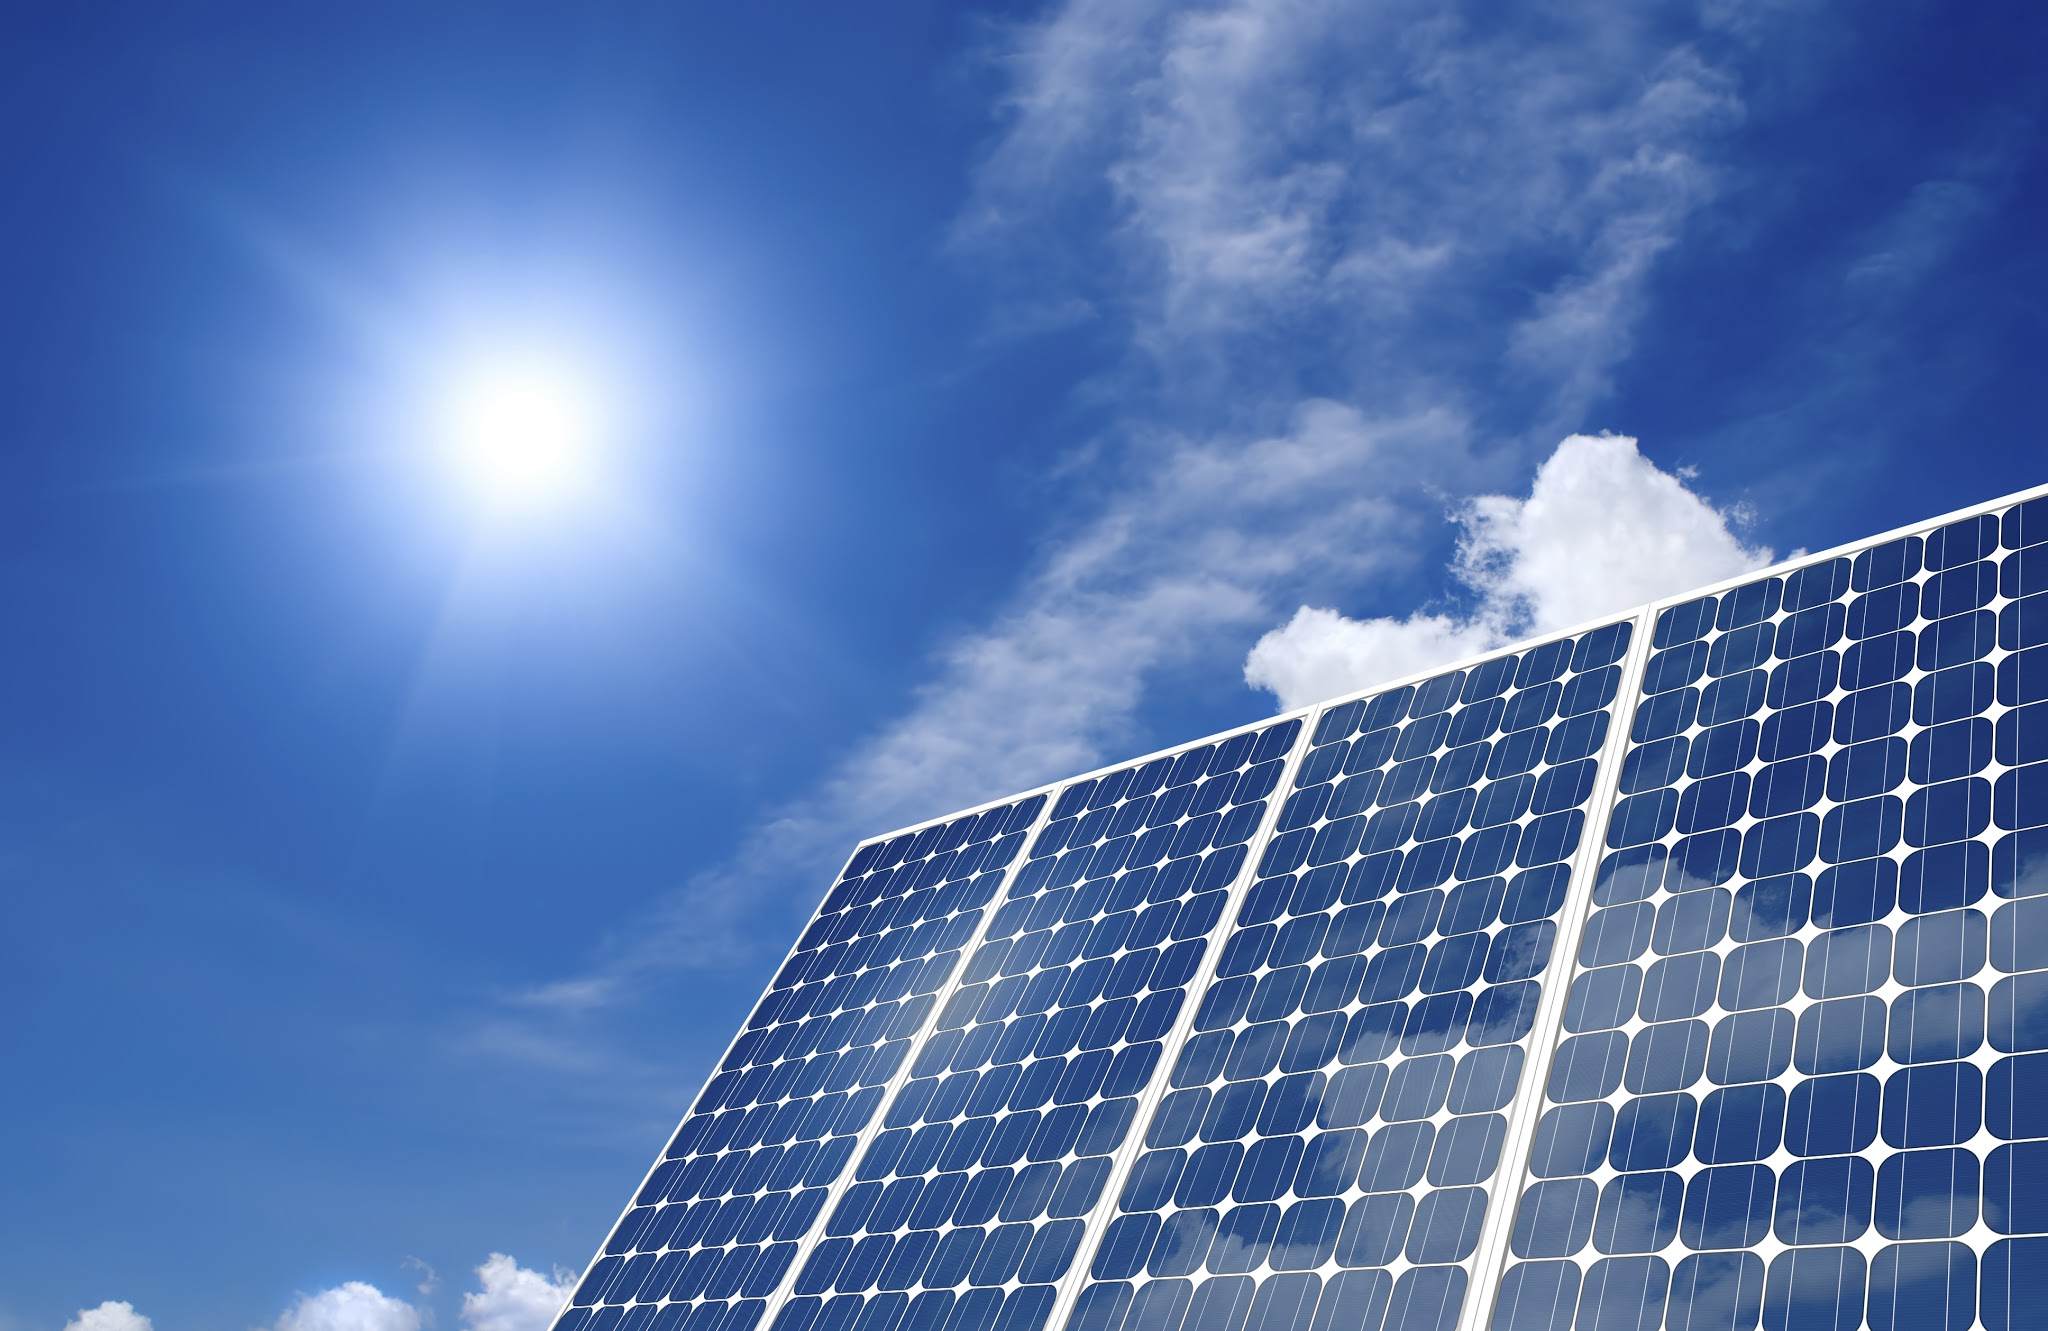 Solar Panels Wallpaper Solar Panel 2048x1331